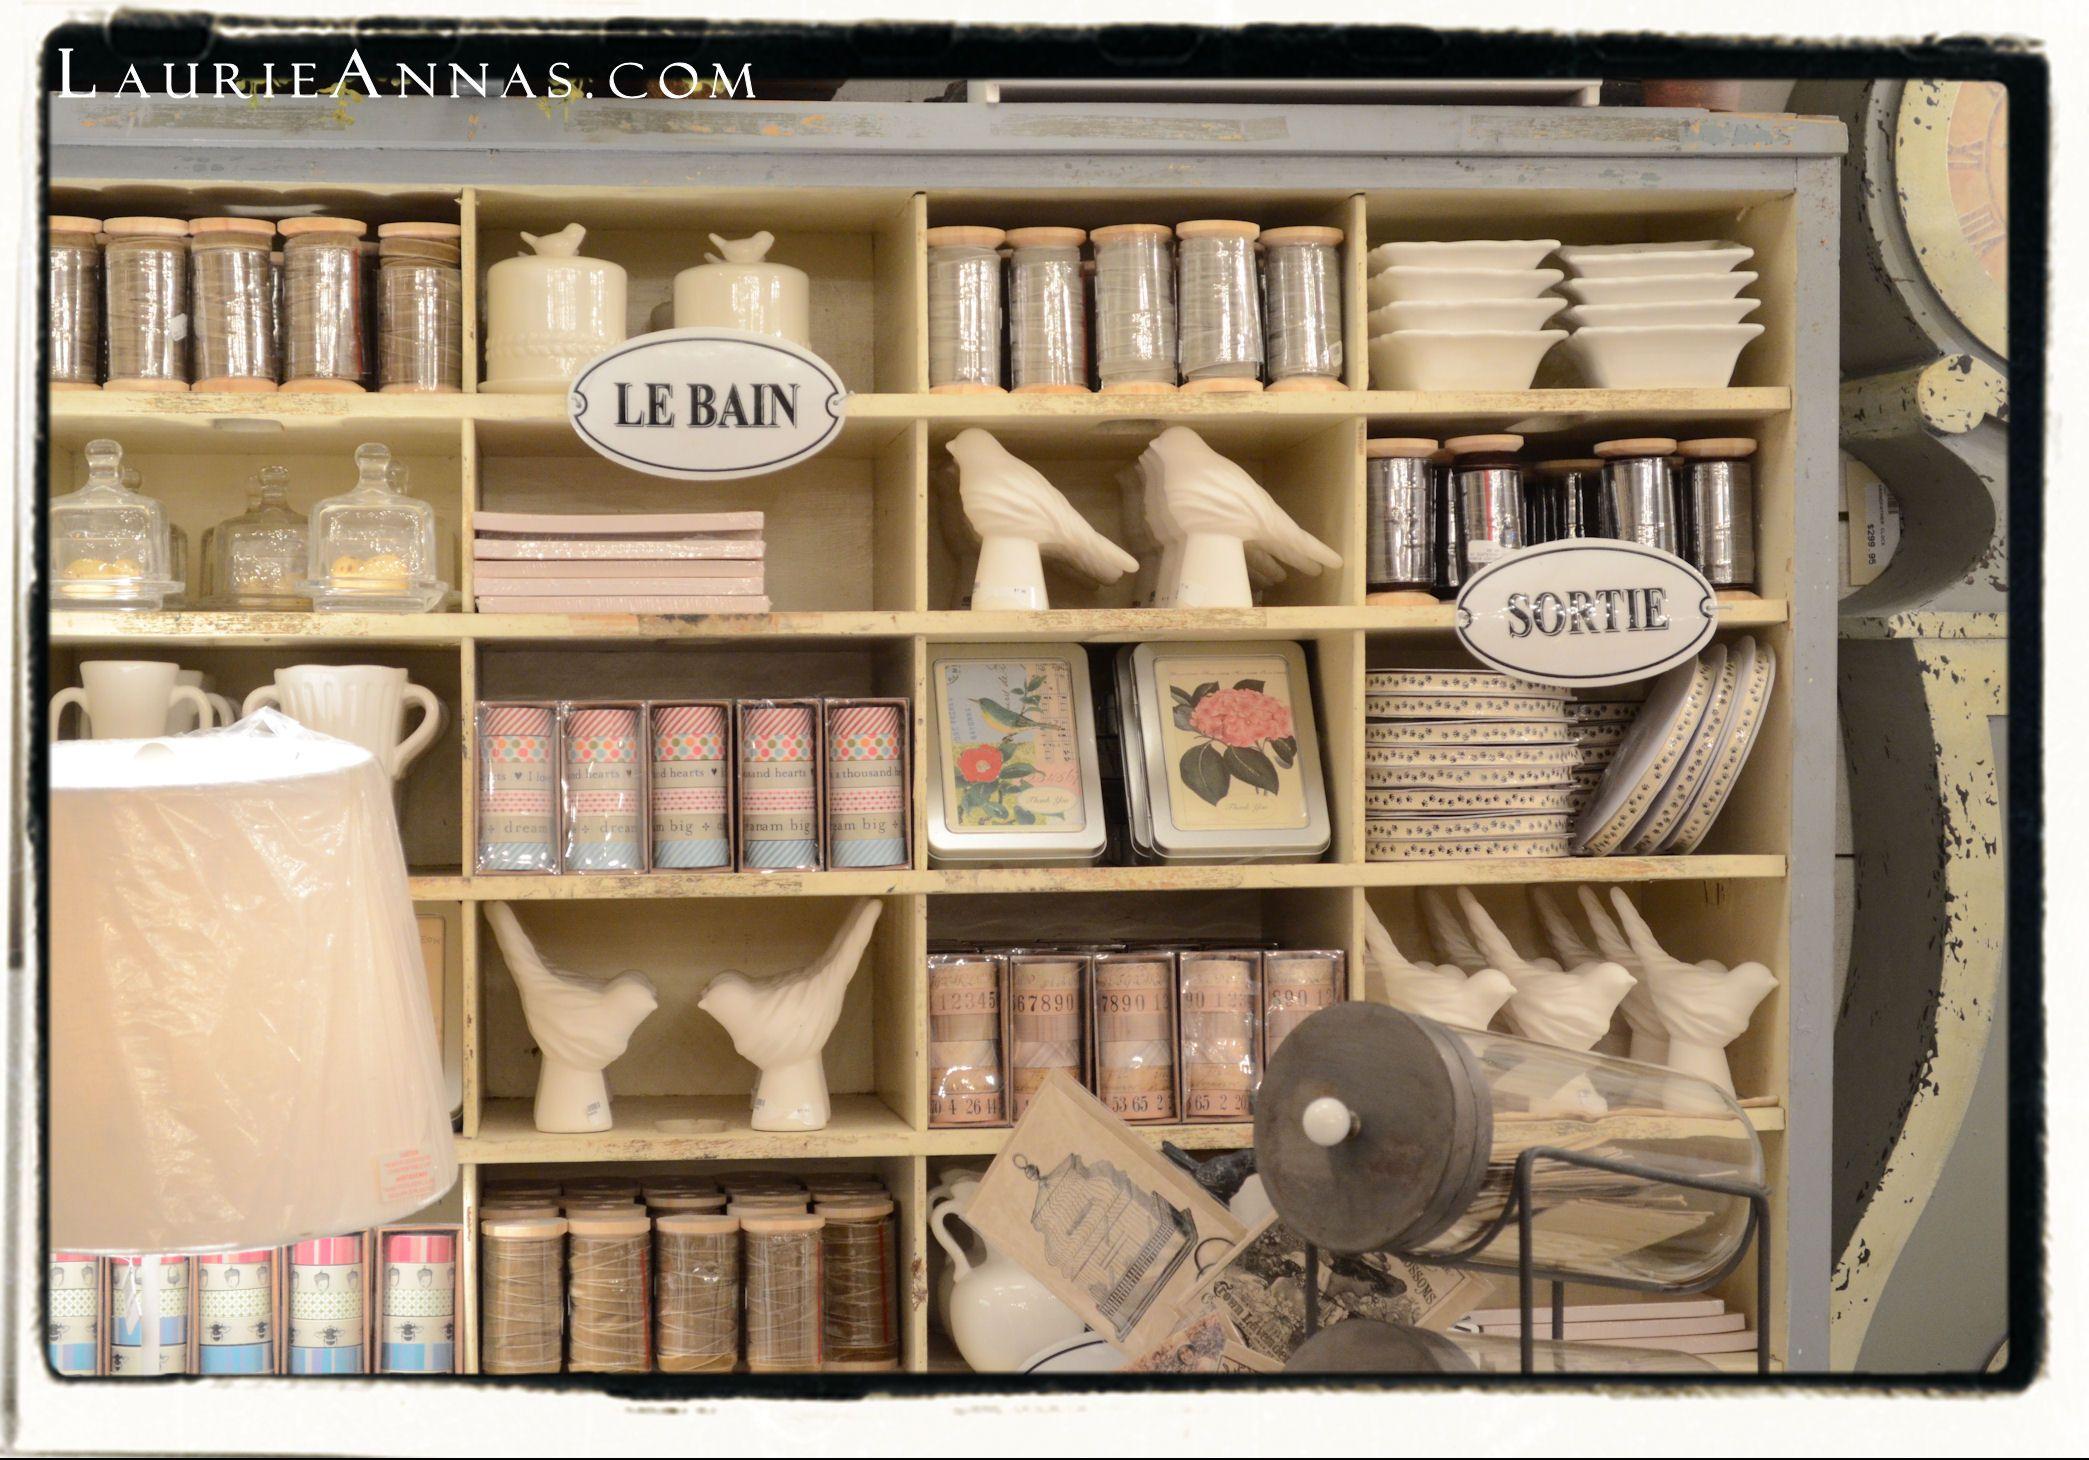 Fun cubbies at LaurieAnna's Vintage Home!   http://laurieannas.com